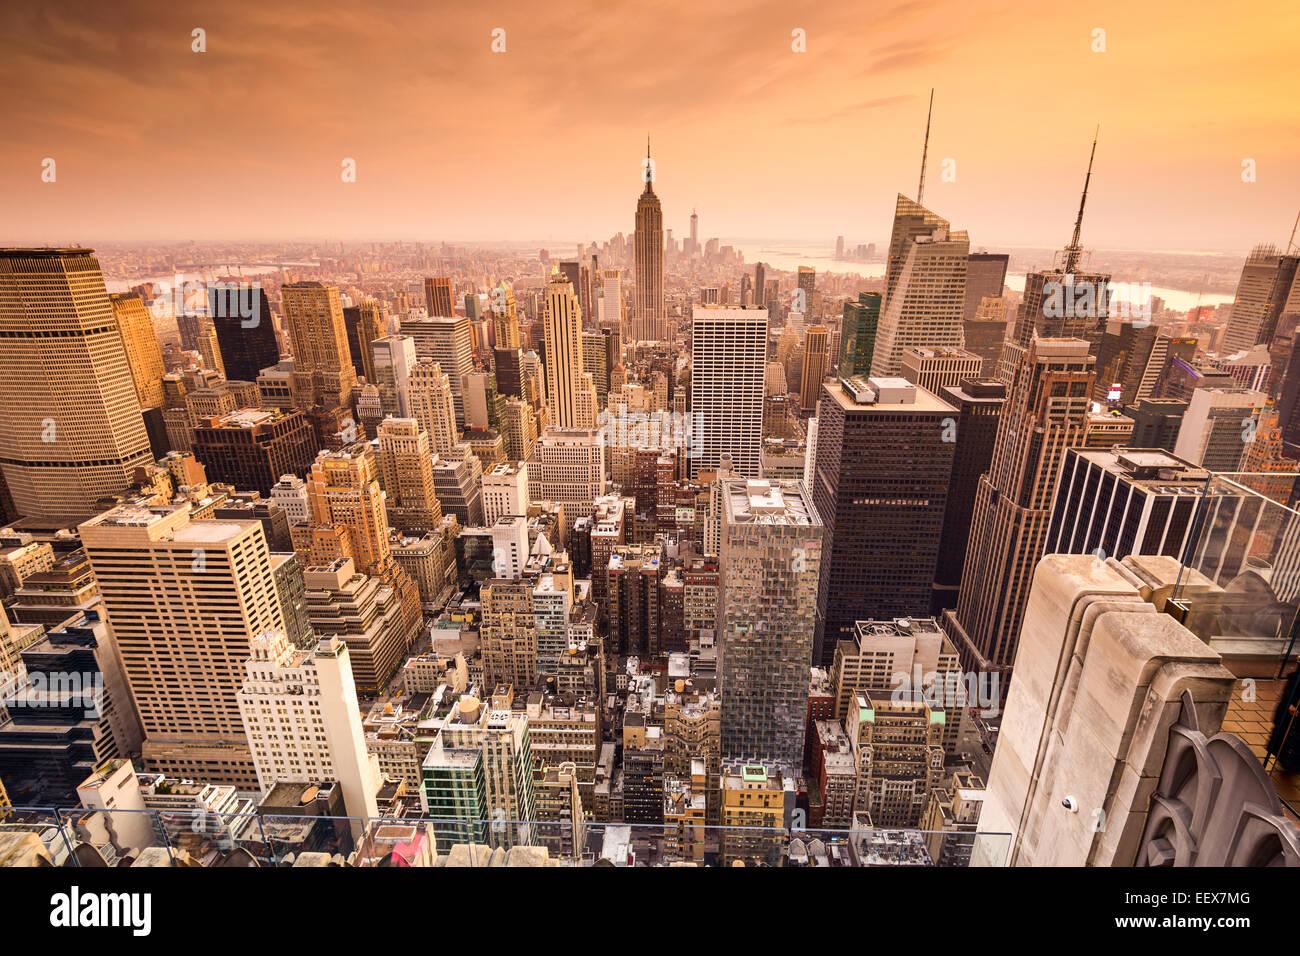 New York City, USA skyline over midtown Manhattan. - Stock Image